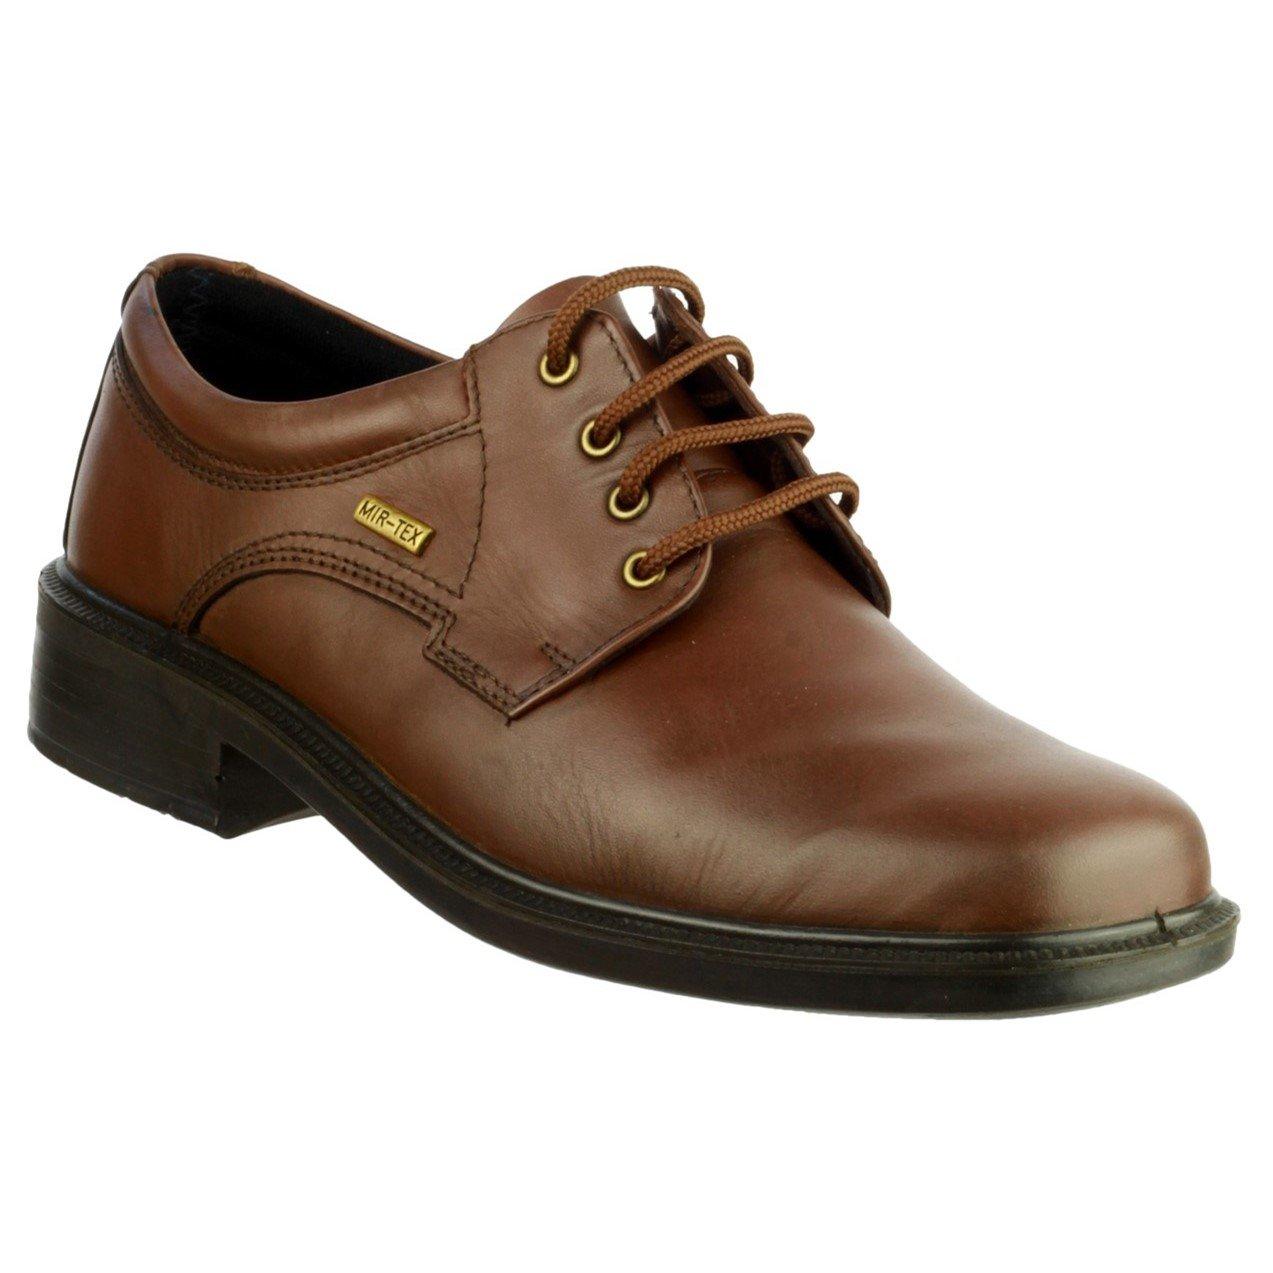 Cotswold Men's Sudeley Waterproof Shoe Various Colours 32970 - Brown 6